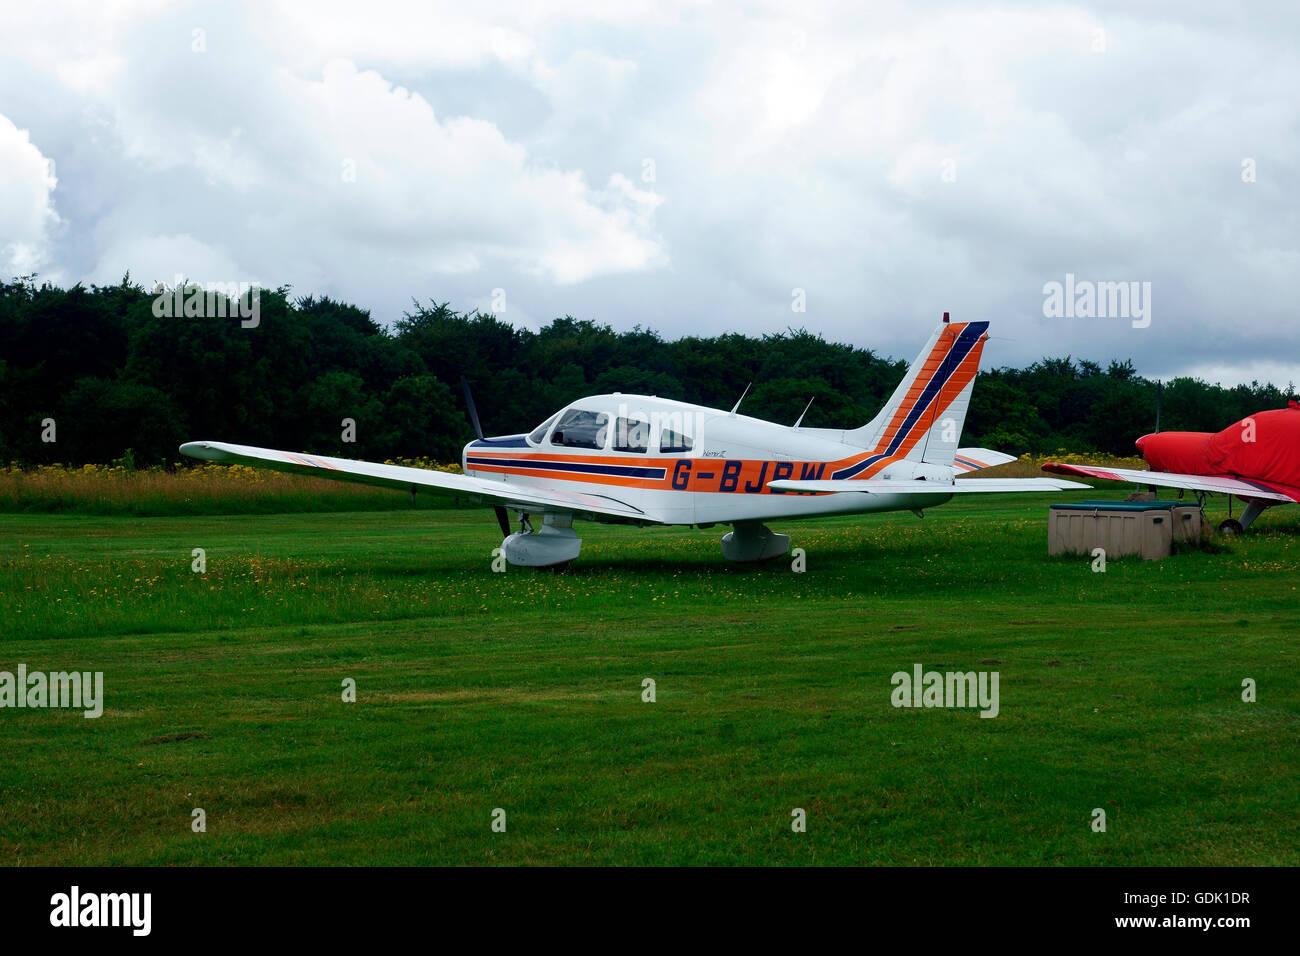 PIPER PA-28-161 CHEROKEE WARRIOR II G-BJBW (N2913Z) - Stock Image